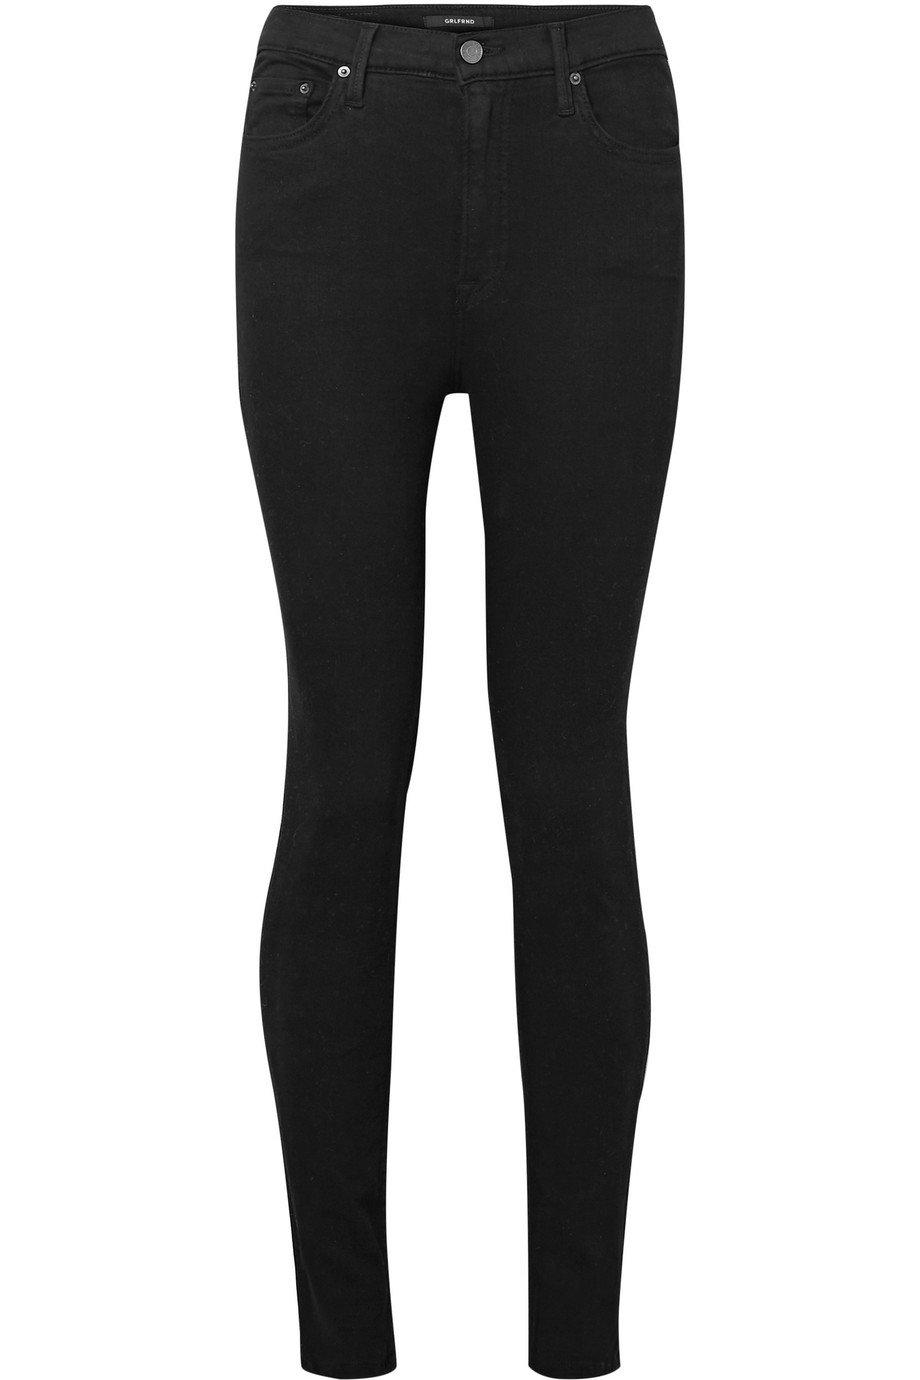 GRLFRND | Kendall high-rise skinny jeans | NET-A-PORTER.COM